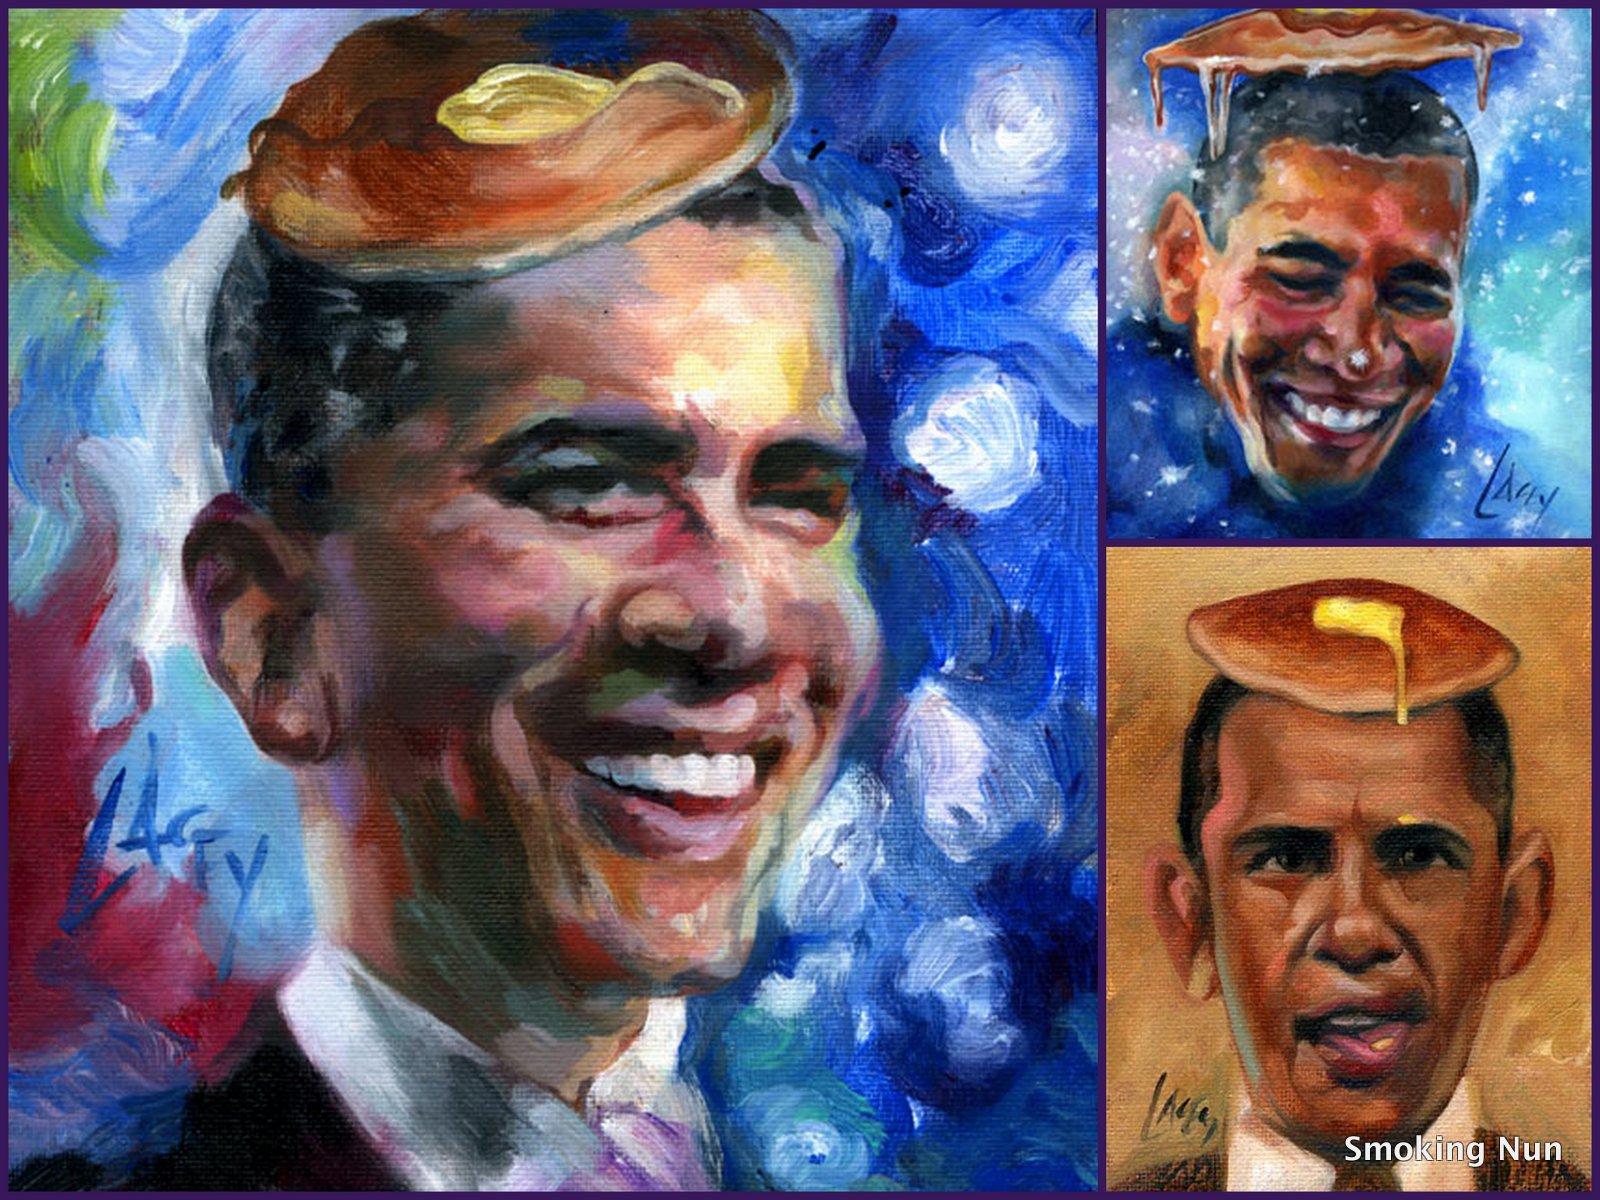 Dan Lacey, The Painter Of Pancakes: Minnesota GOP